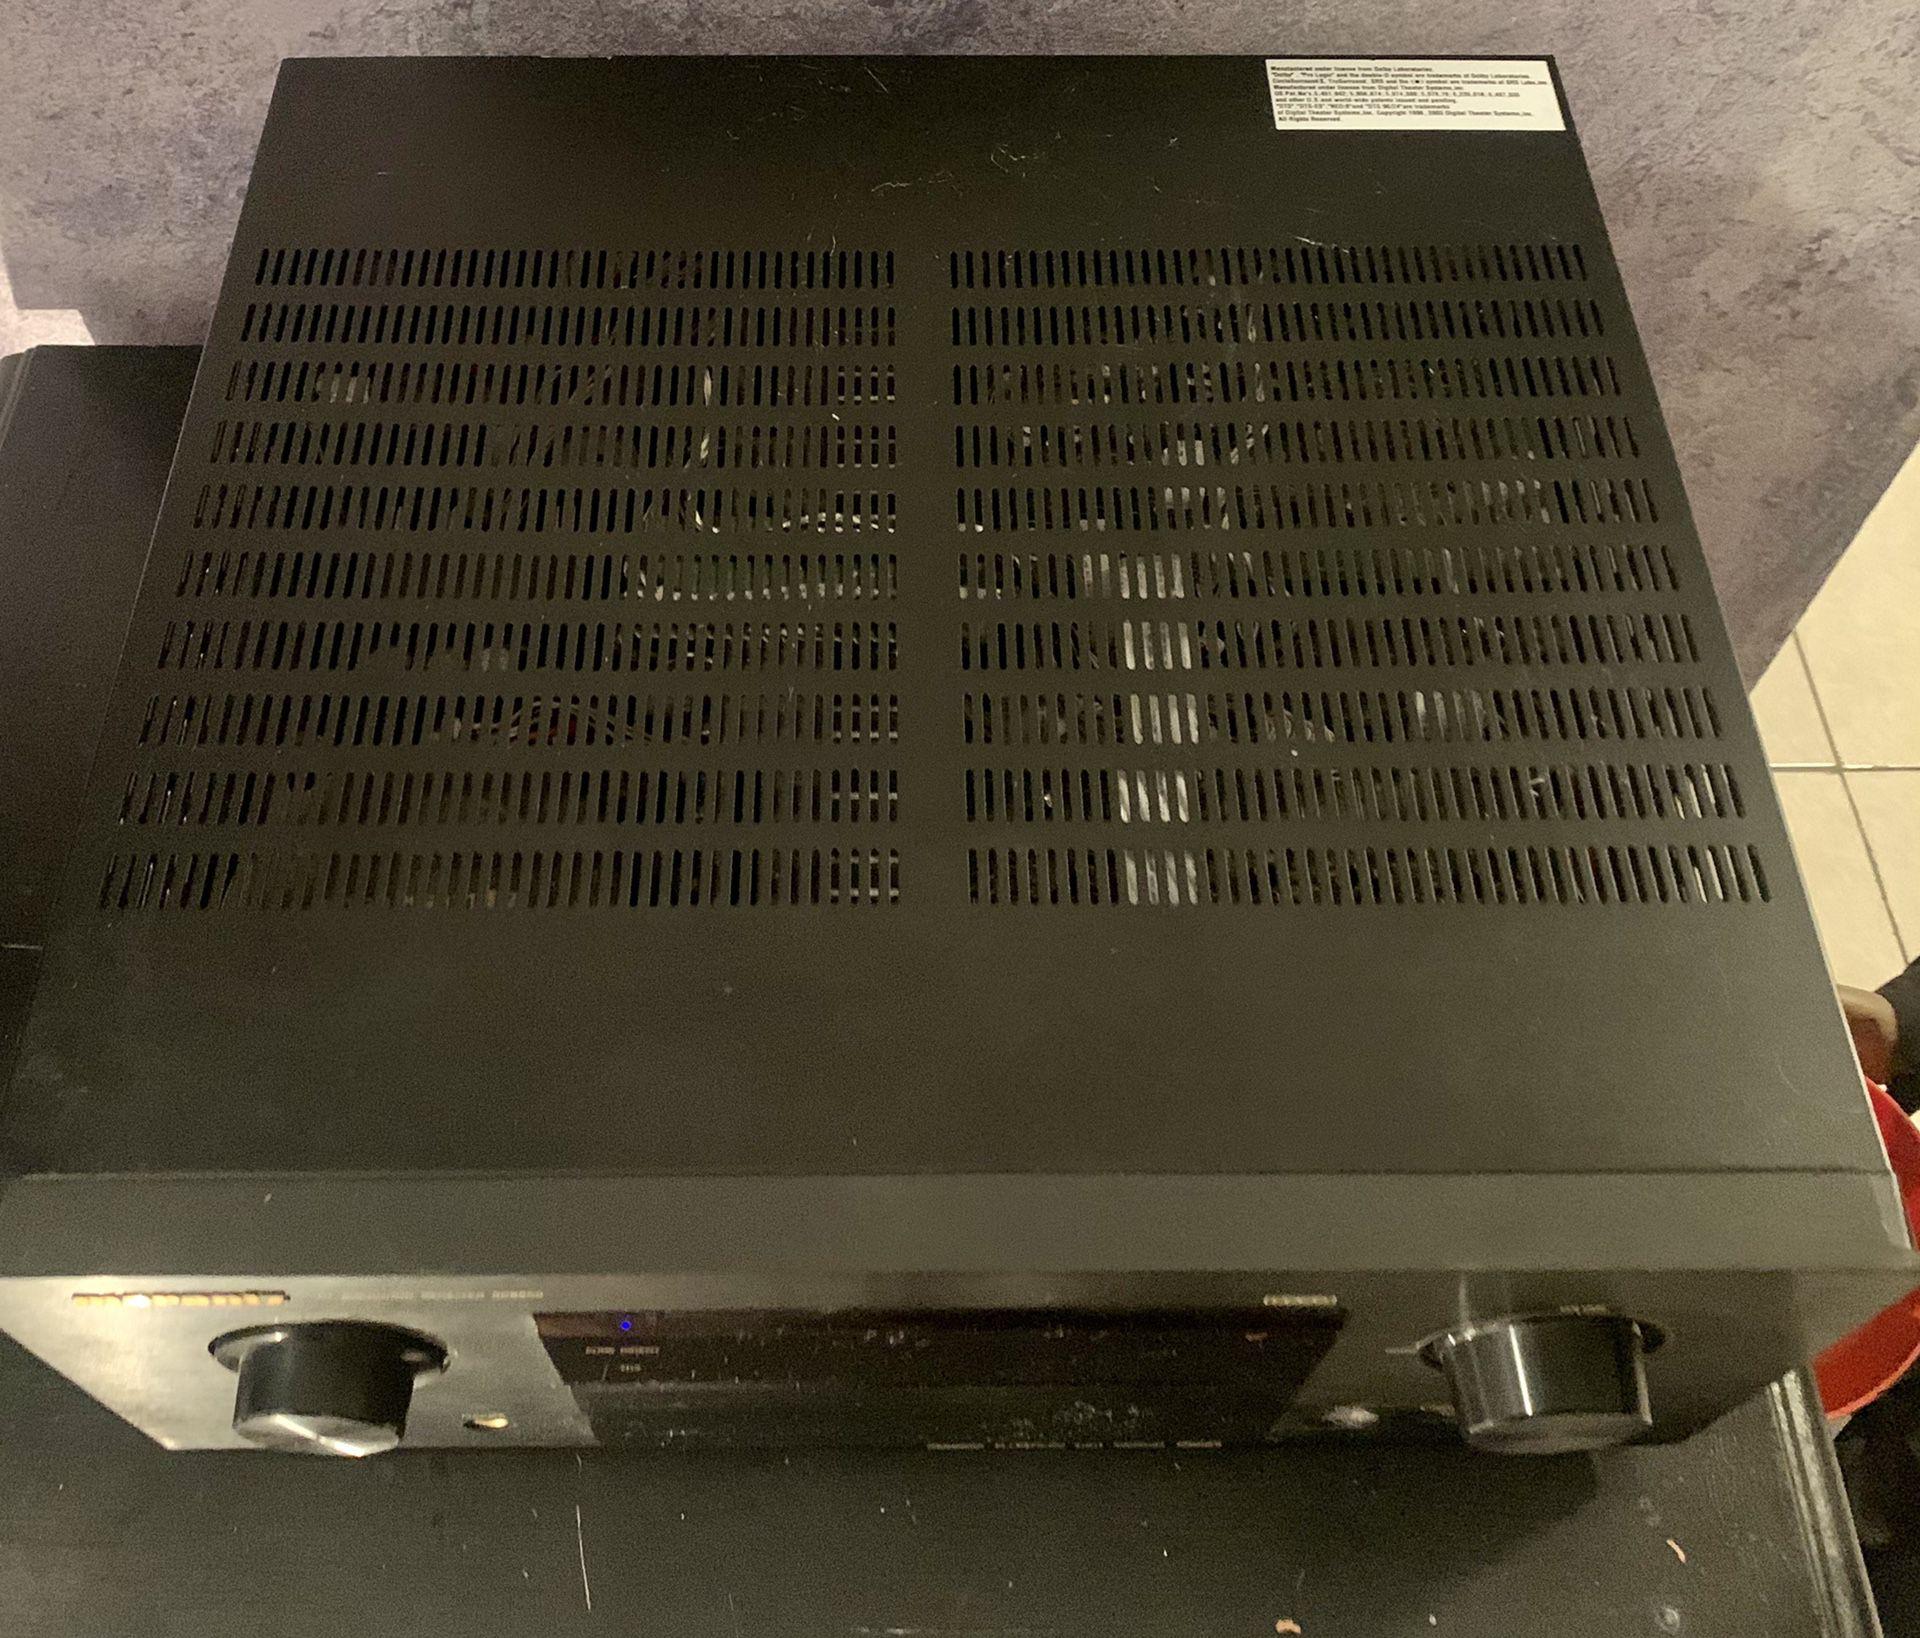 Marantz SR850O Pro Home Theater Receiver